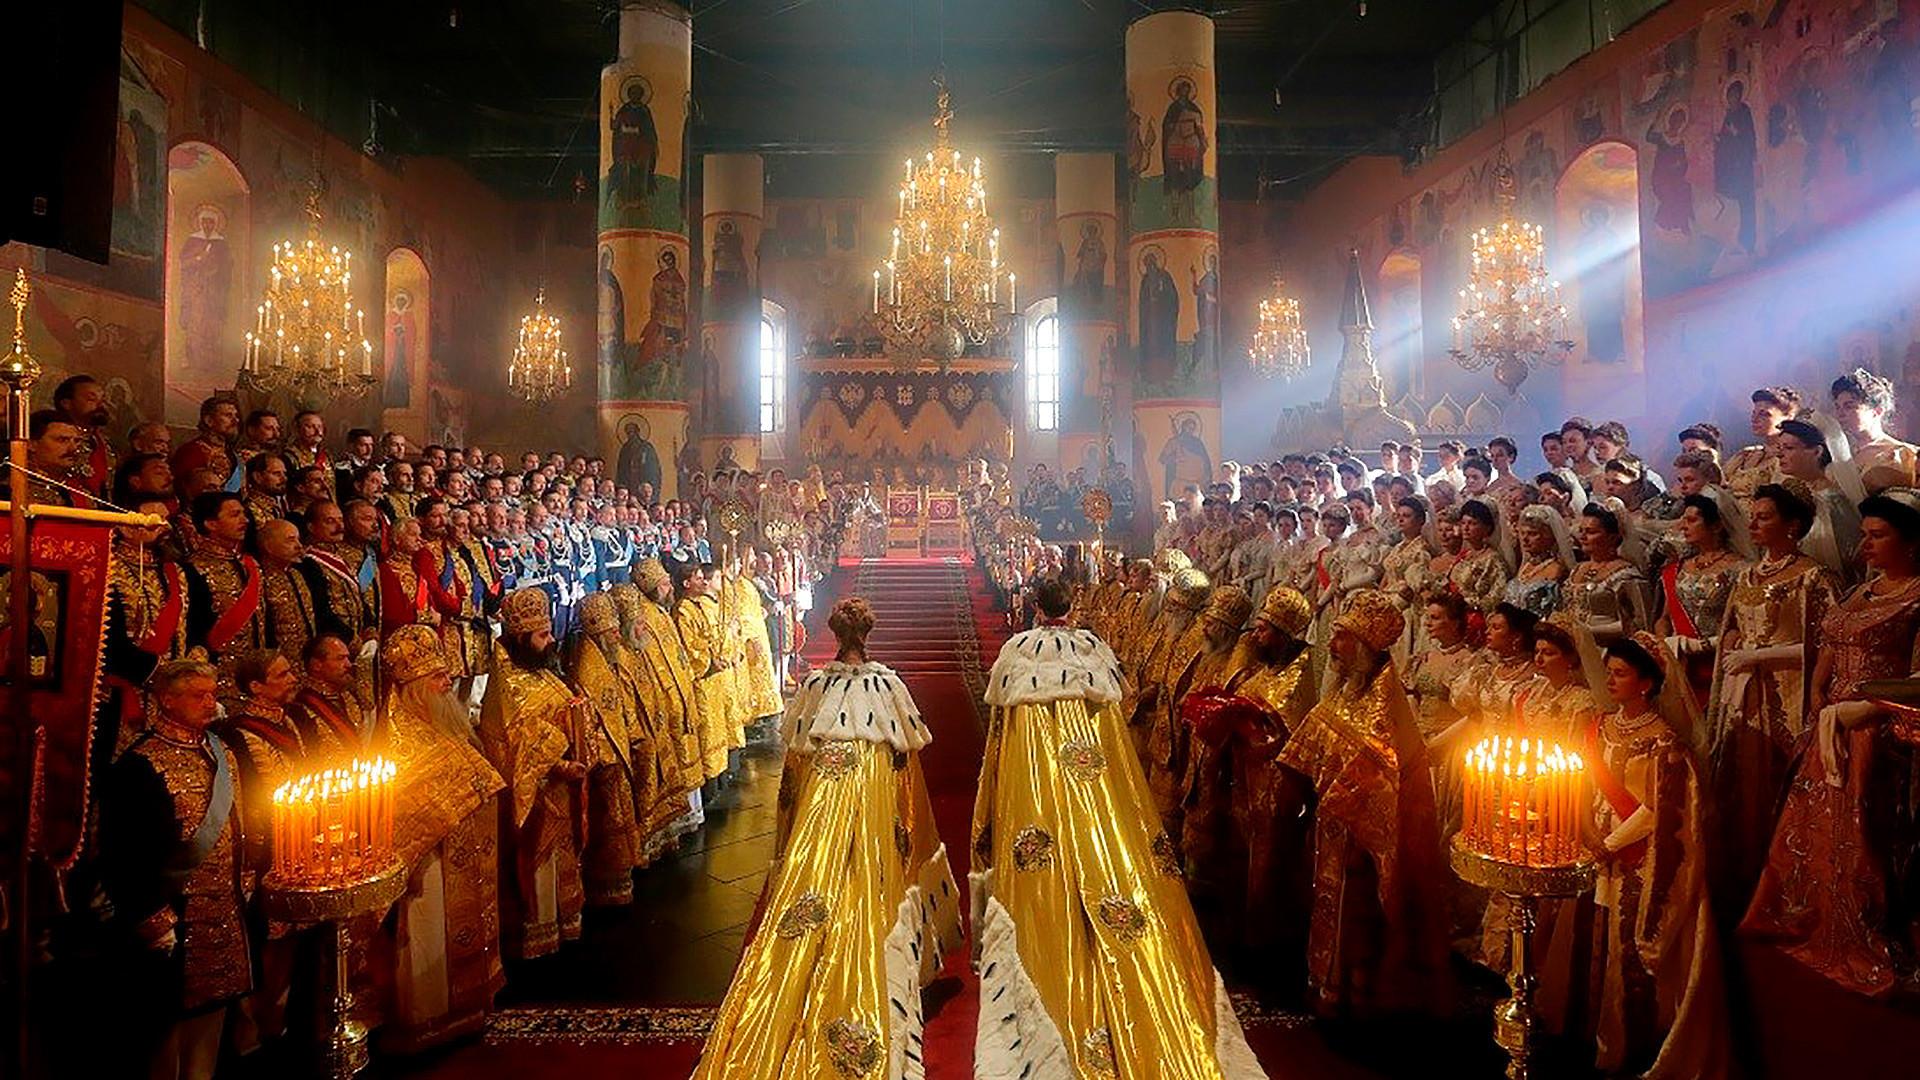 Krunidba Nikolaja II. u moskovskom Kremlju.